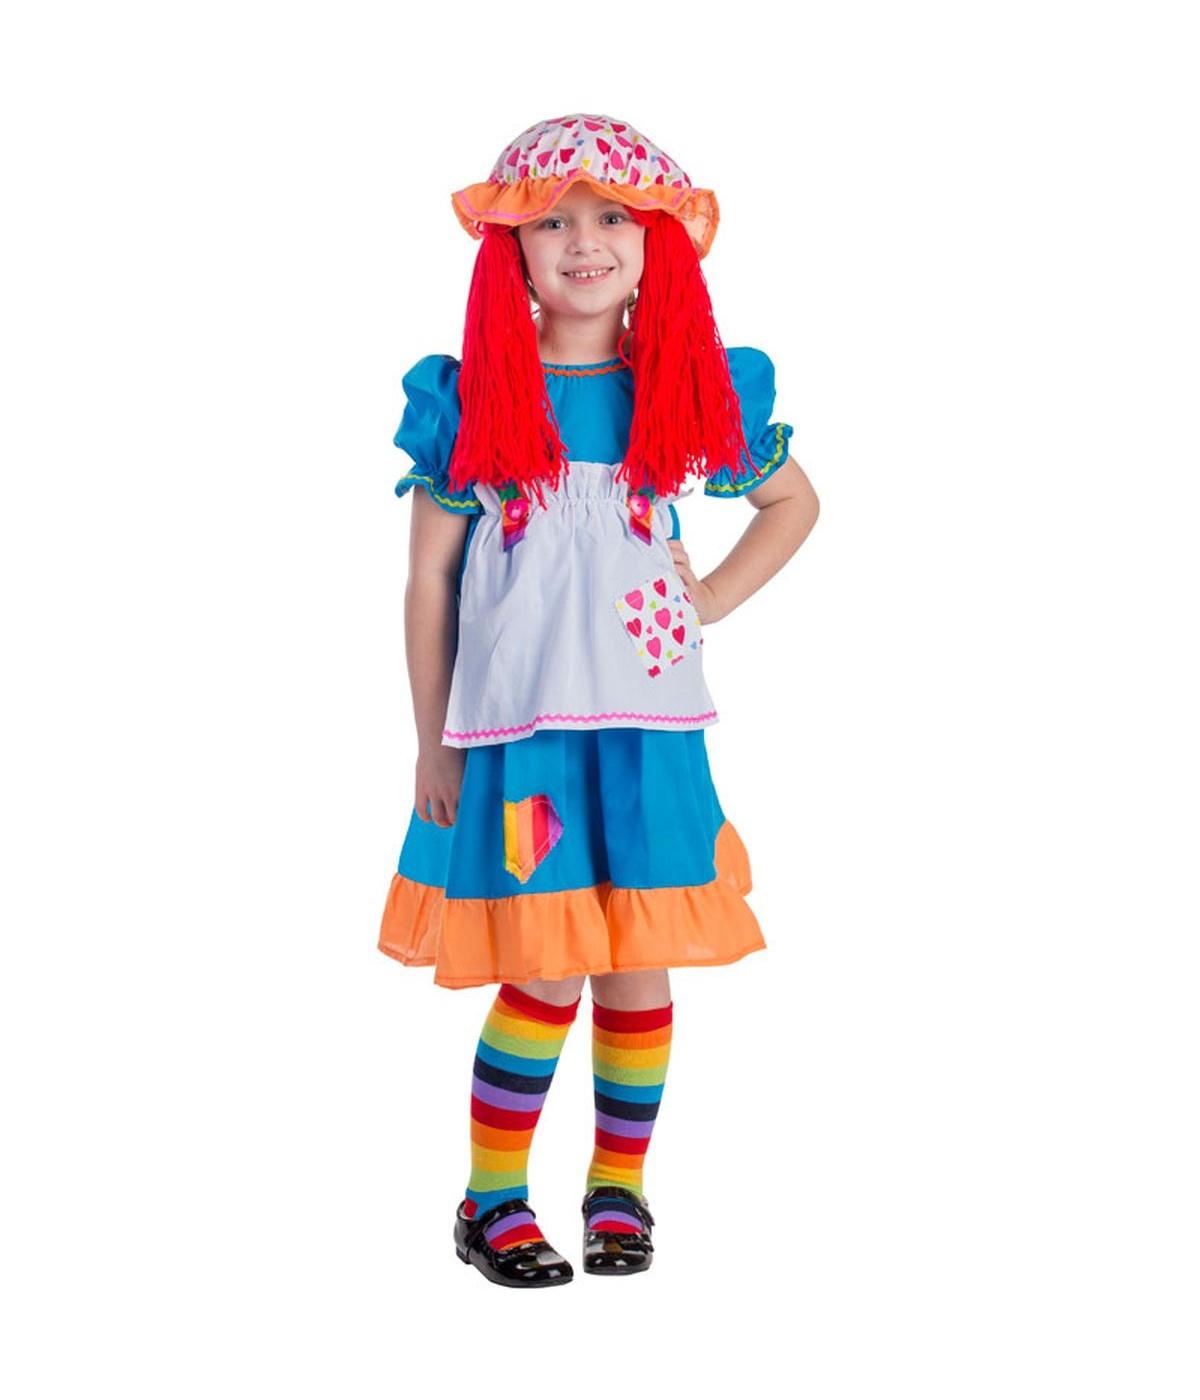 rainbowrag doll toddlergirls costume general category